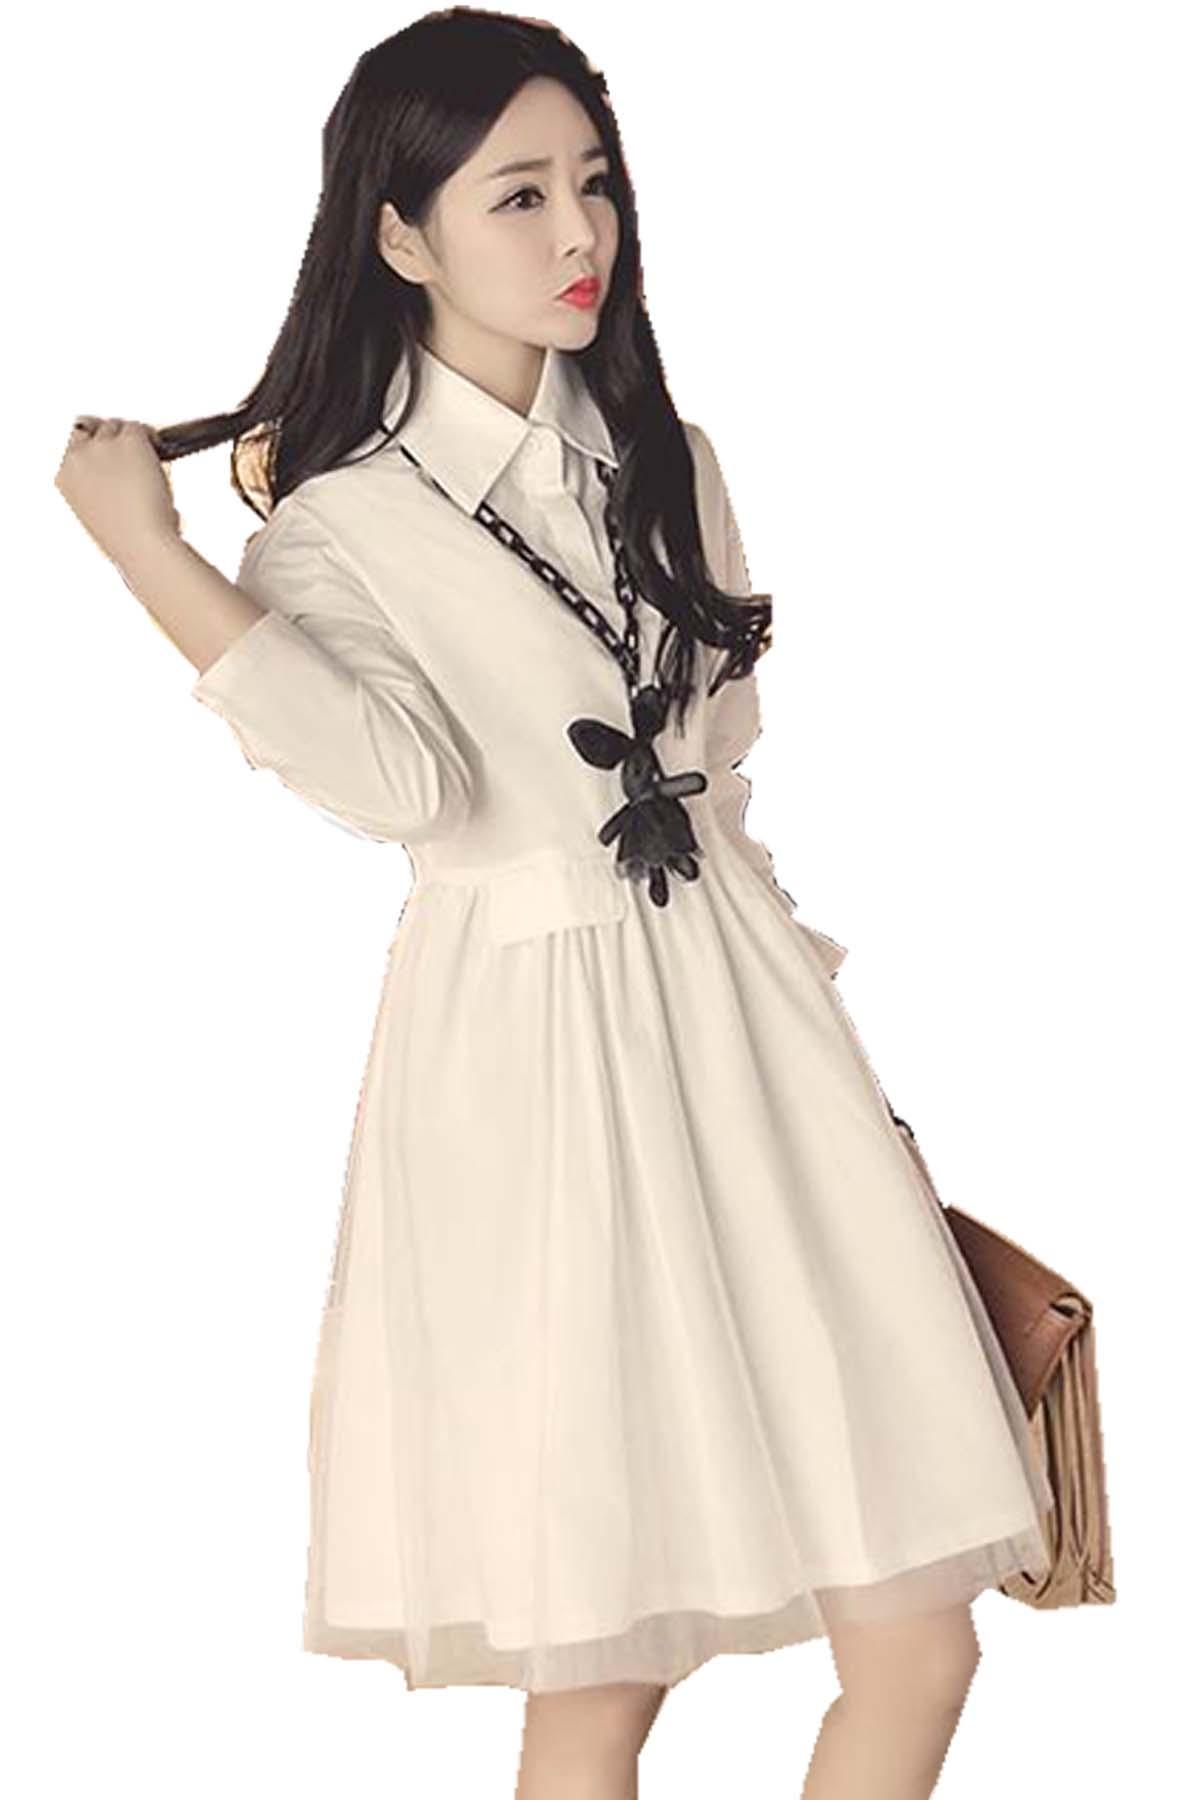 Plain maternity long sleeved dress end 10242019 1044 pm plain maternity long sleeved dress xl xxl xxxl white ombrellifo Choice Image